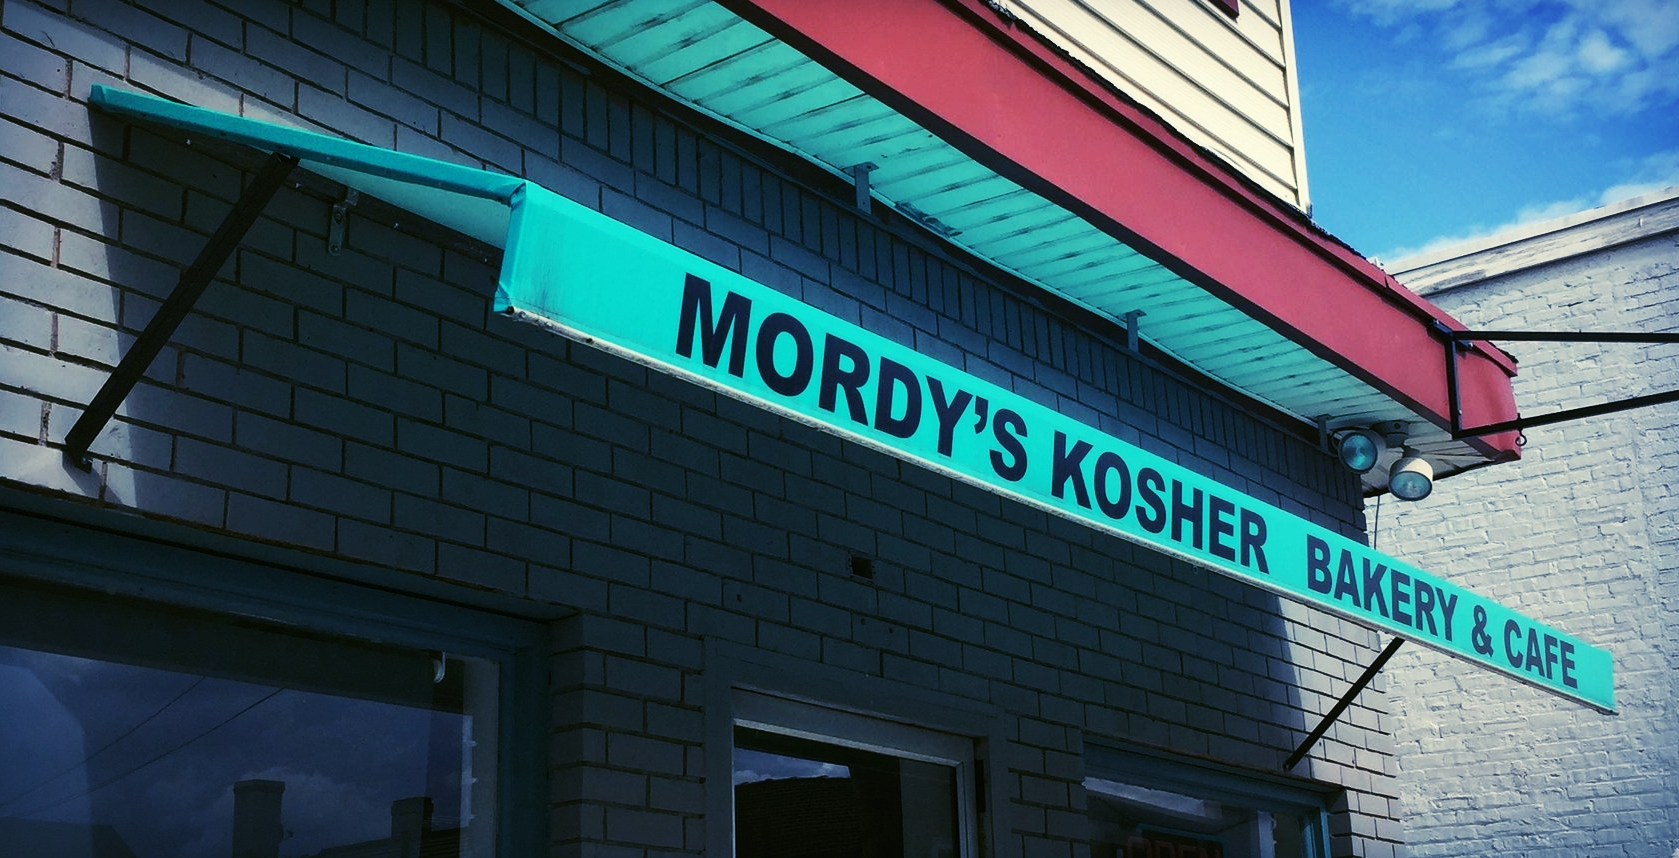 Awning Sign at Mordy's Kosher Bakery & Cafe